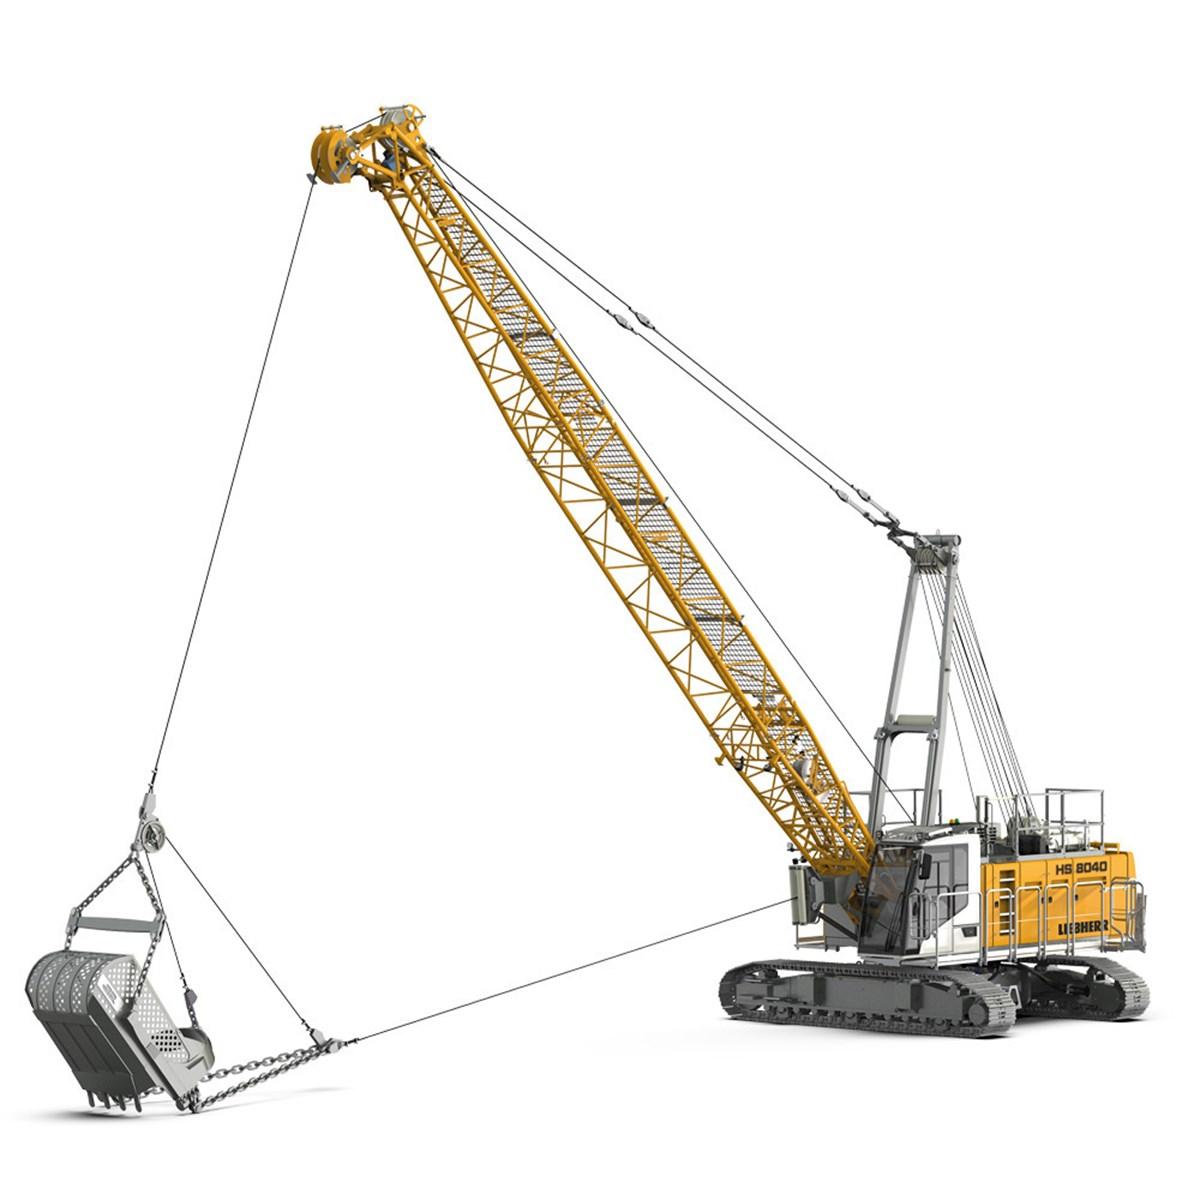 liebherr-hs-8040-1-duty-cycle-crawler-crane-seilbagger-rendering-dragline.jpg